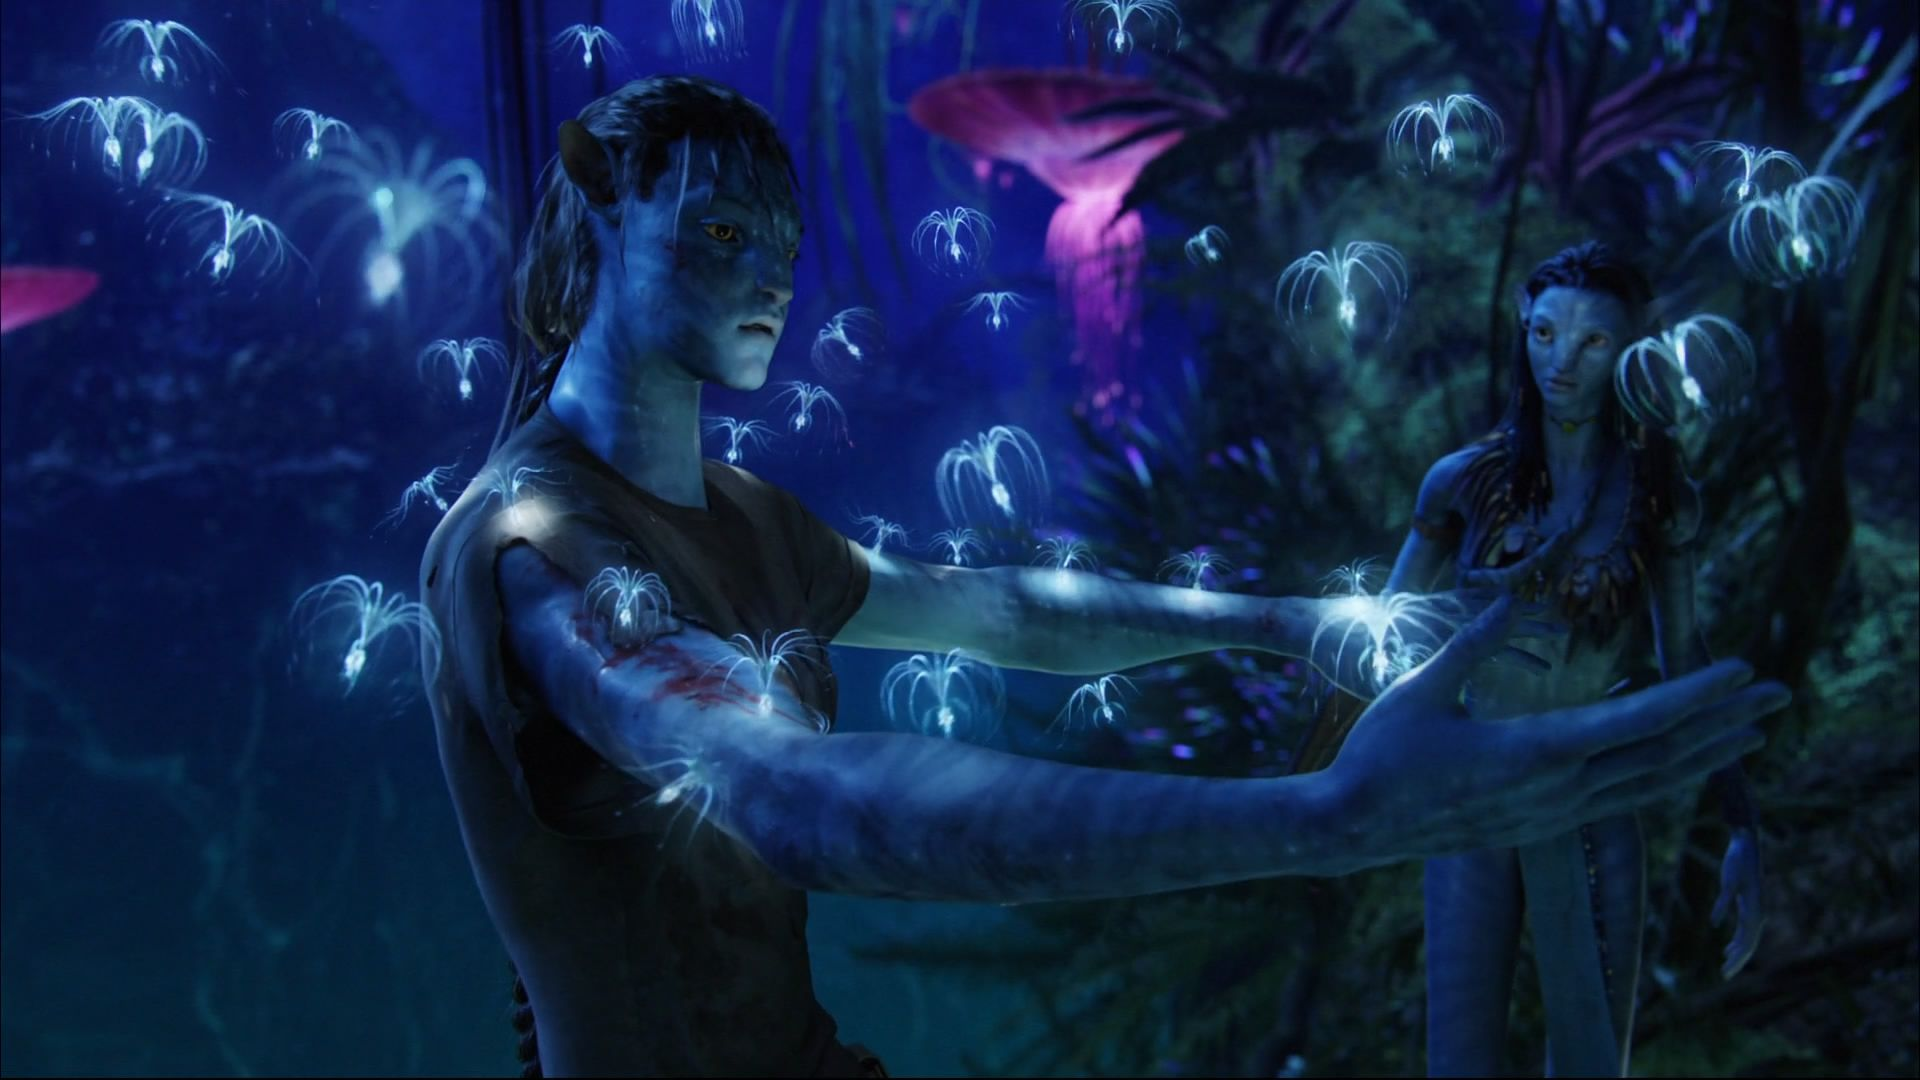 243 Avatar Hd Wallpapers Backgrounds Wallpaper Abyss Avatars